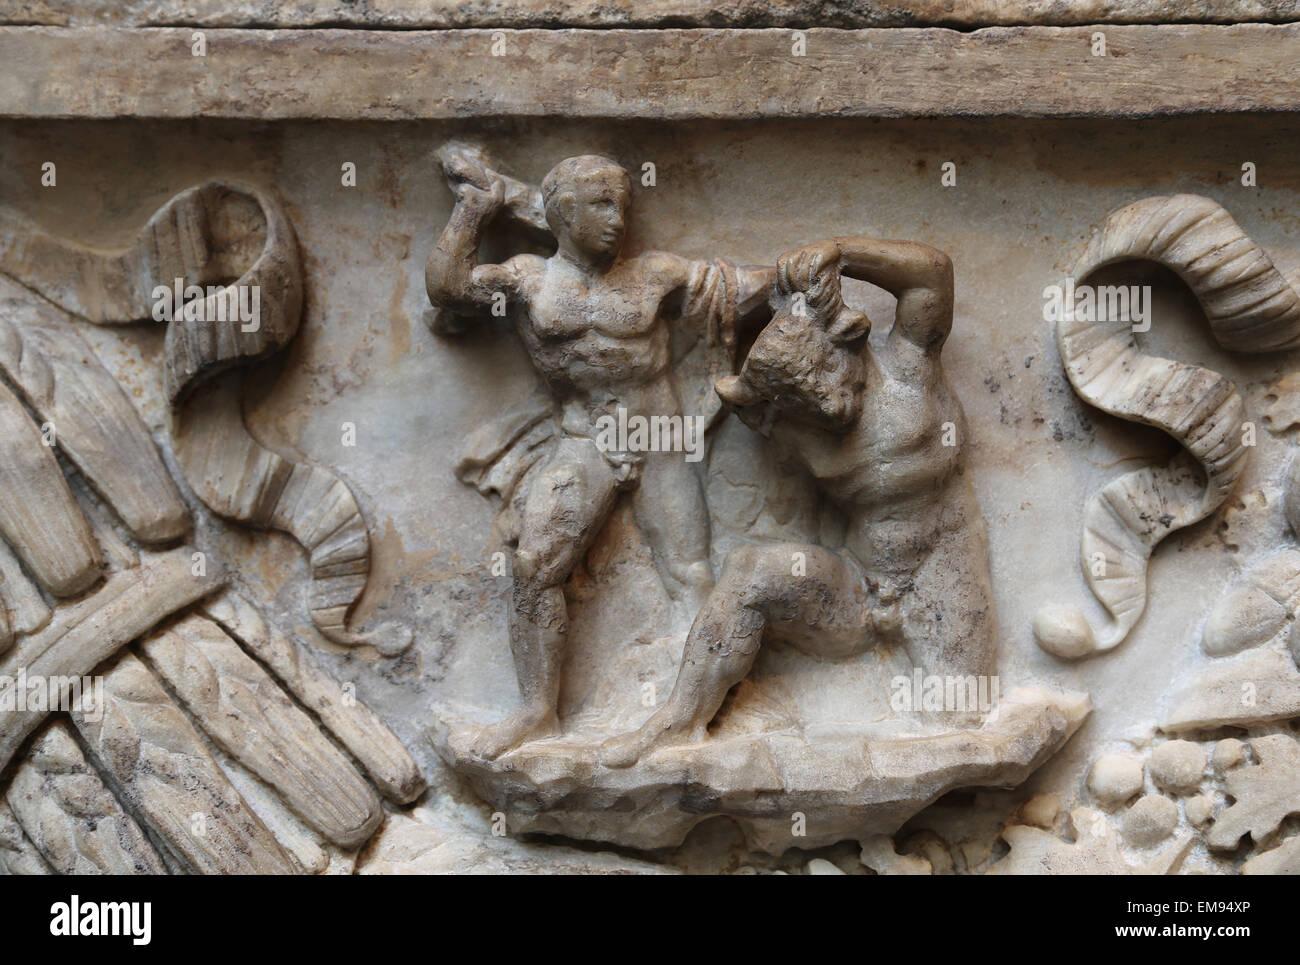 Roman sarcophagus. Myth of Theseus and Ariadne. Hadrianic or Early Antonine period, 130-140 AD. Theseus killing - Stock Image